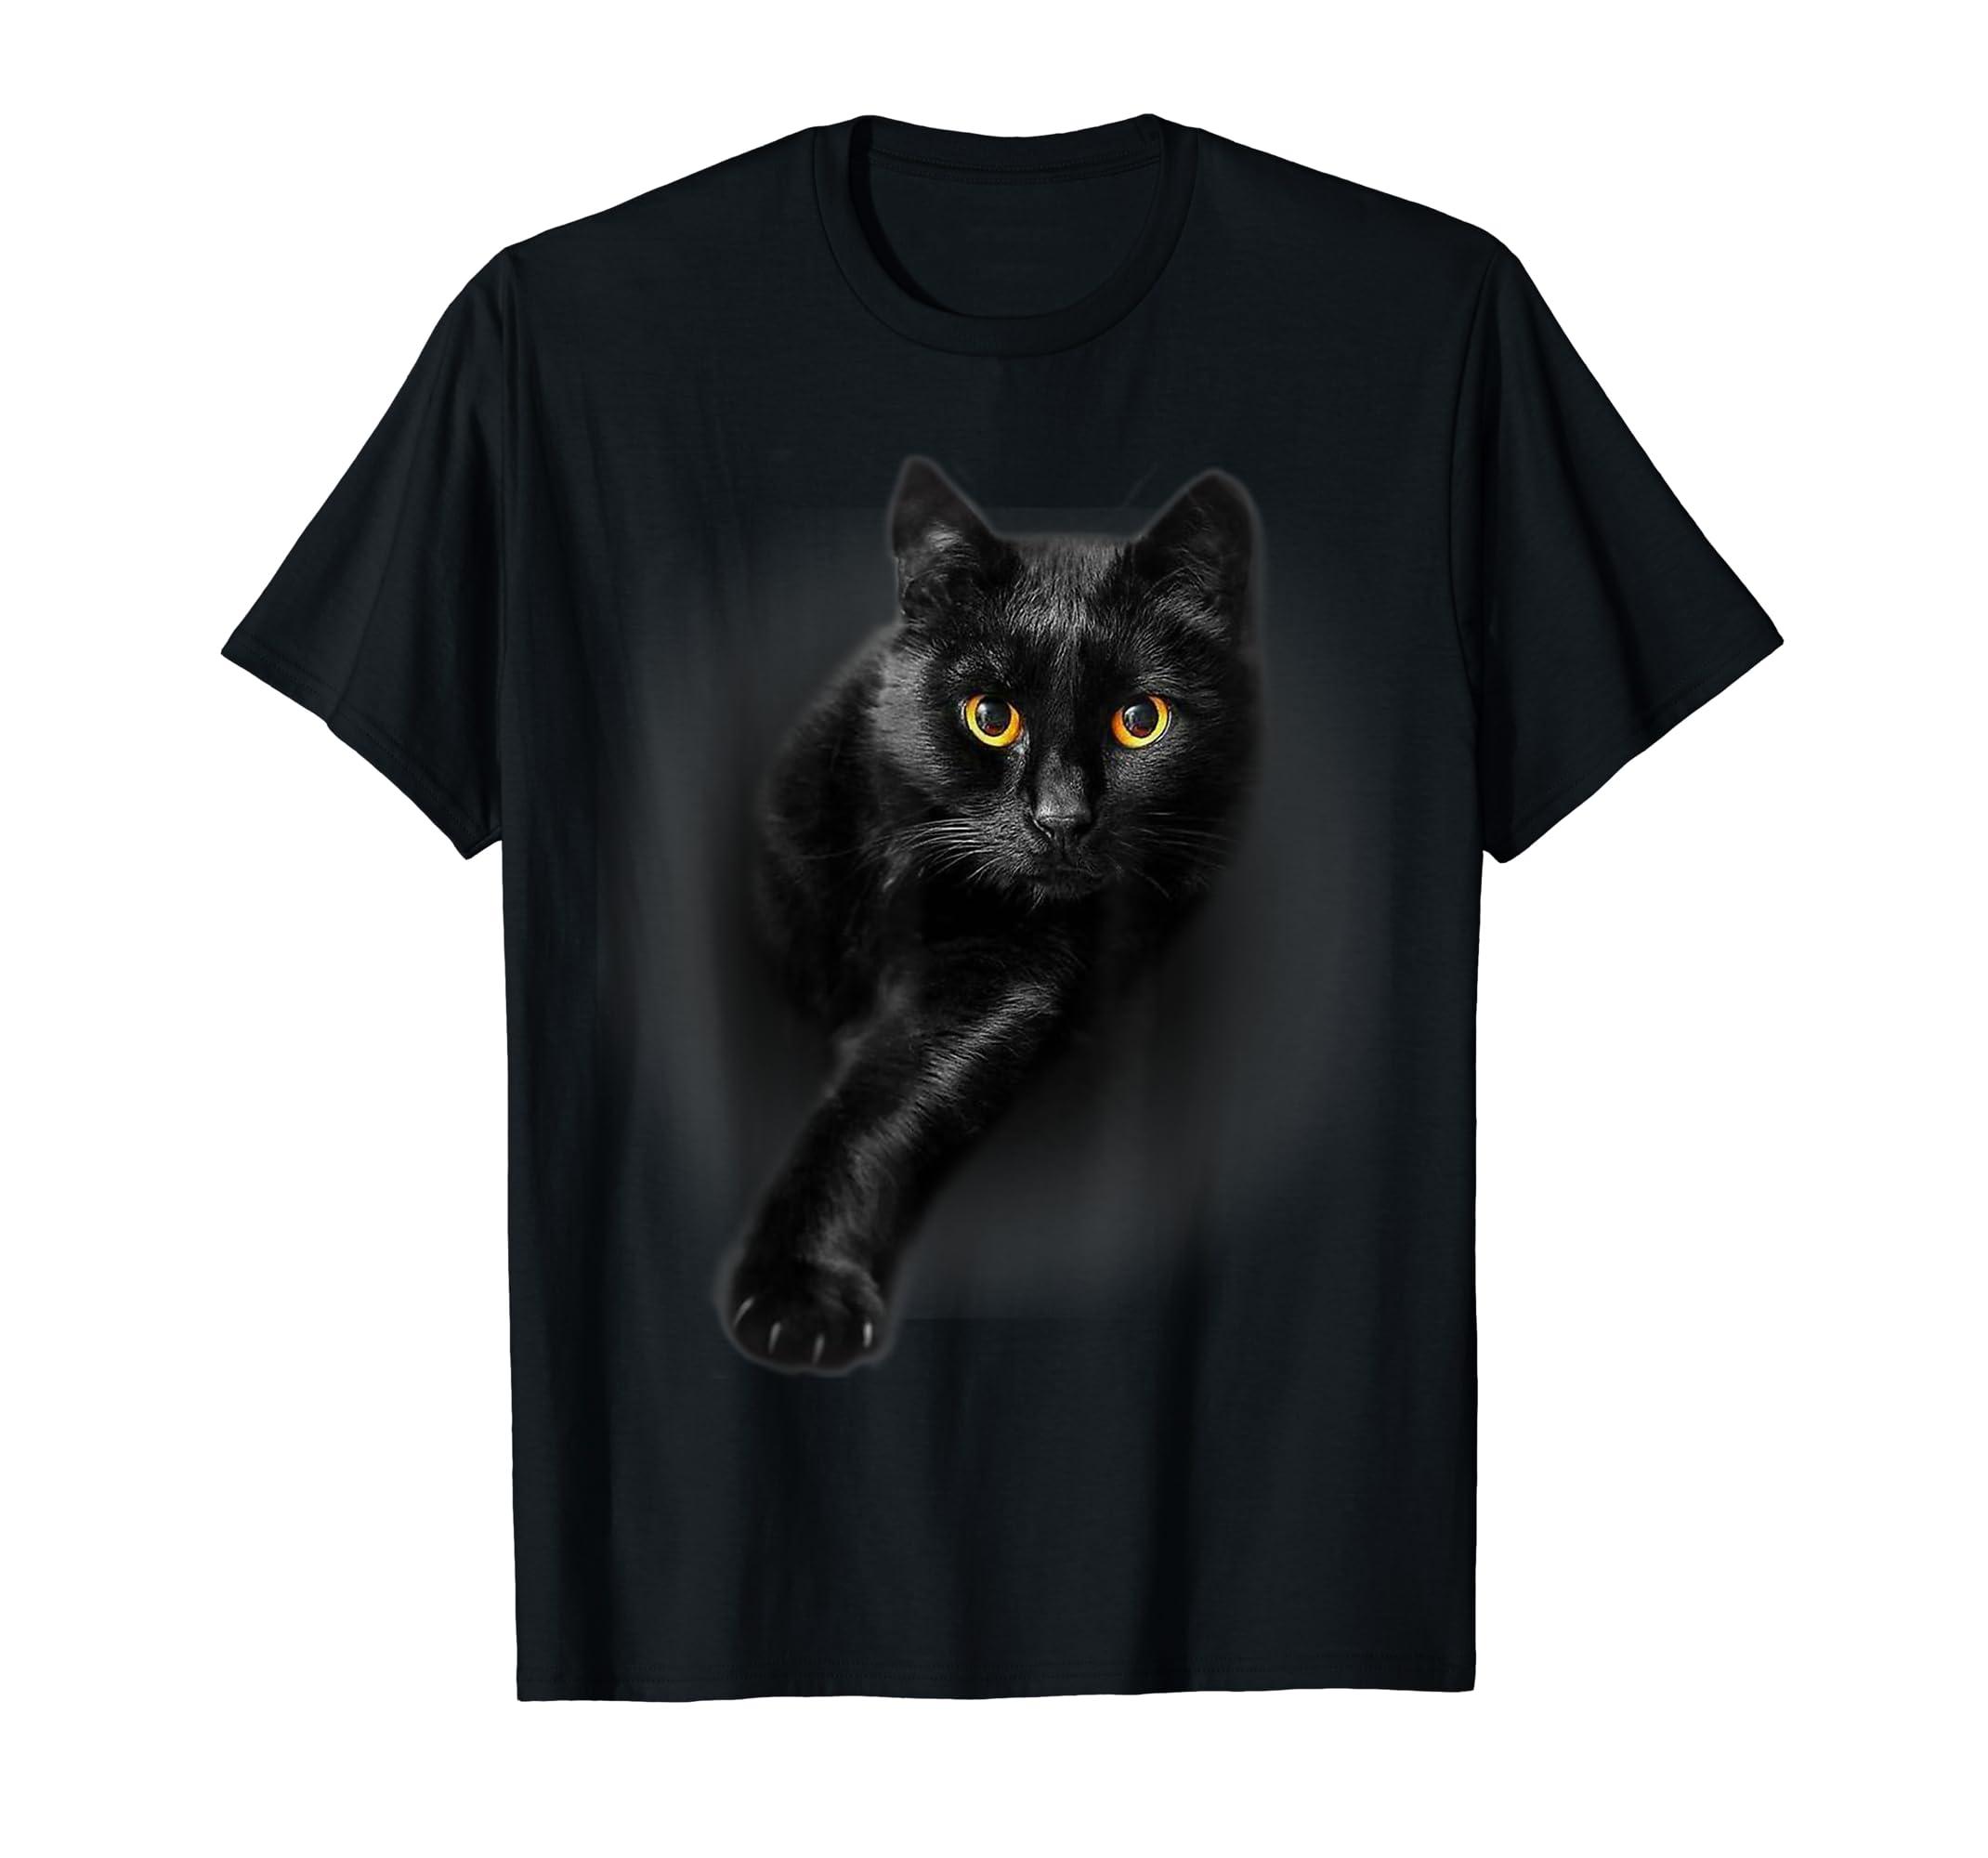 Black Cat Yellow Eyes T-Shirt Cats Tee Shirt Gifts-Men's T-Shirt-Black